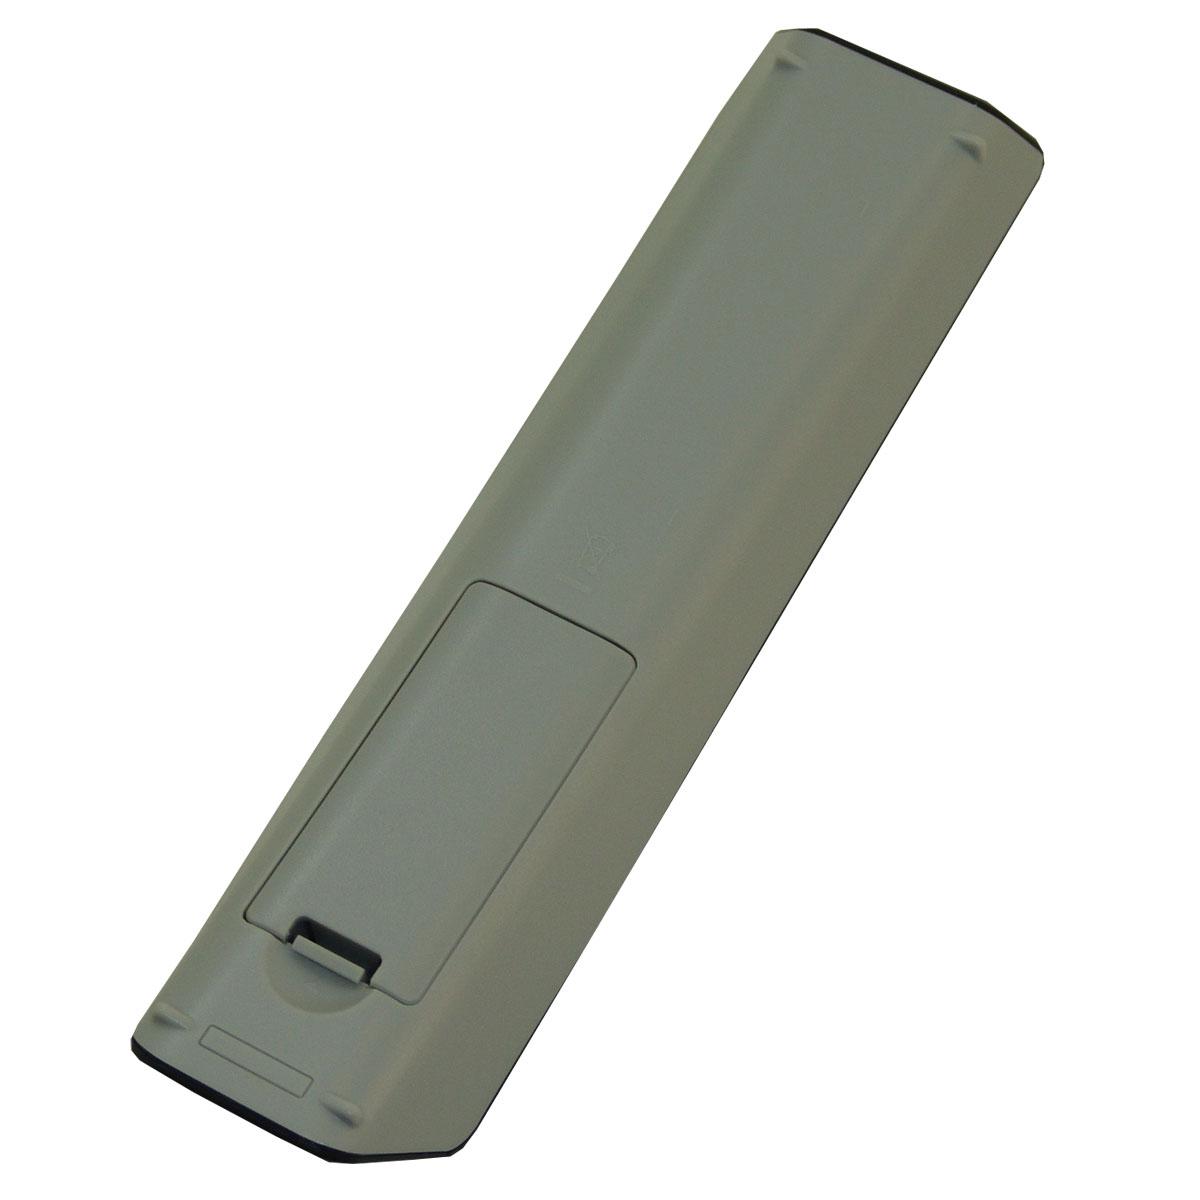 samsung aa59 00600a remote manual